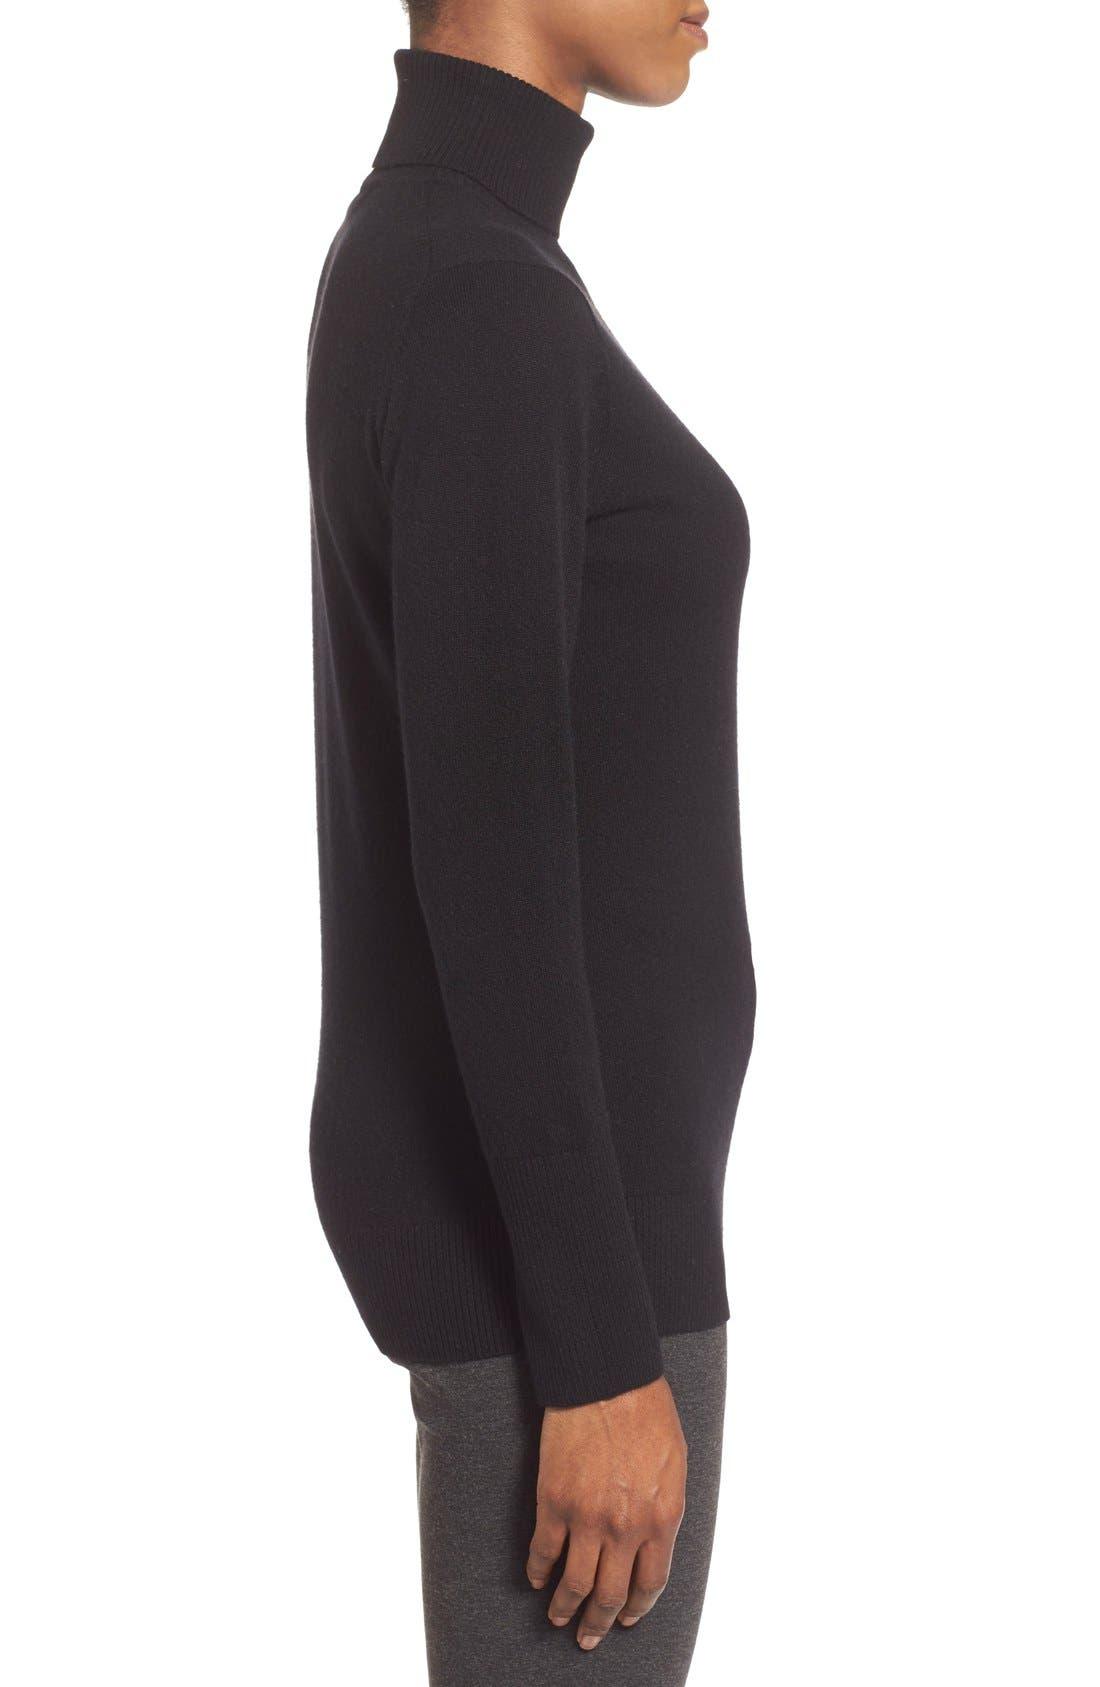 NORDSTROM COLLECTION,                             Cashmere Turtleneck Sweater,                             Alternate thumbnail 3, color,                             001